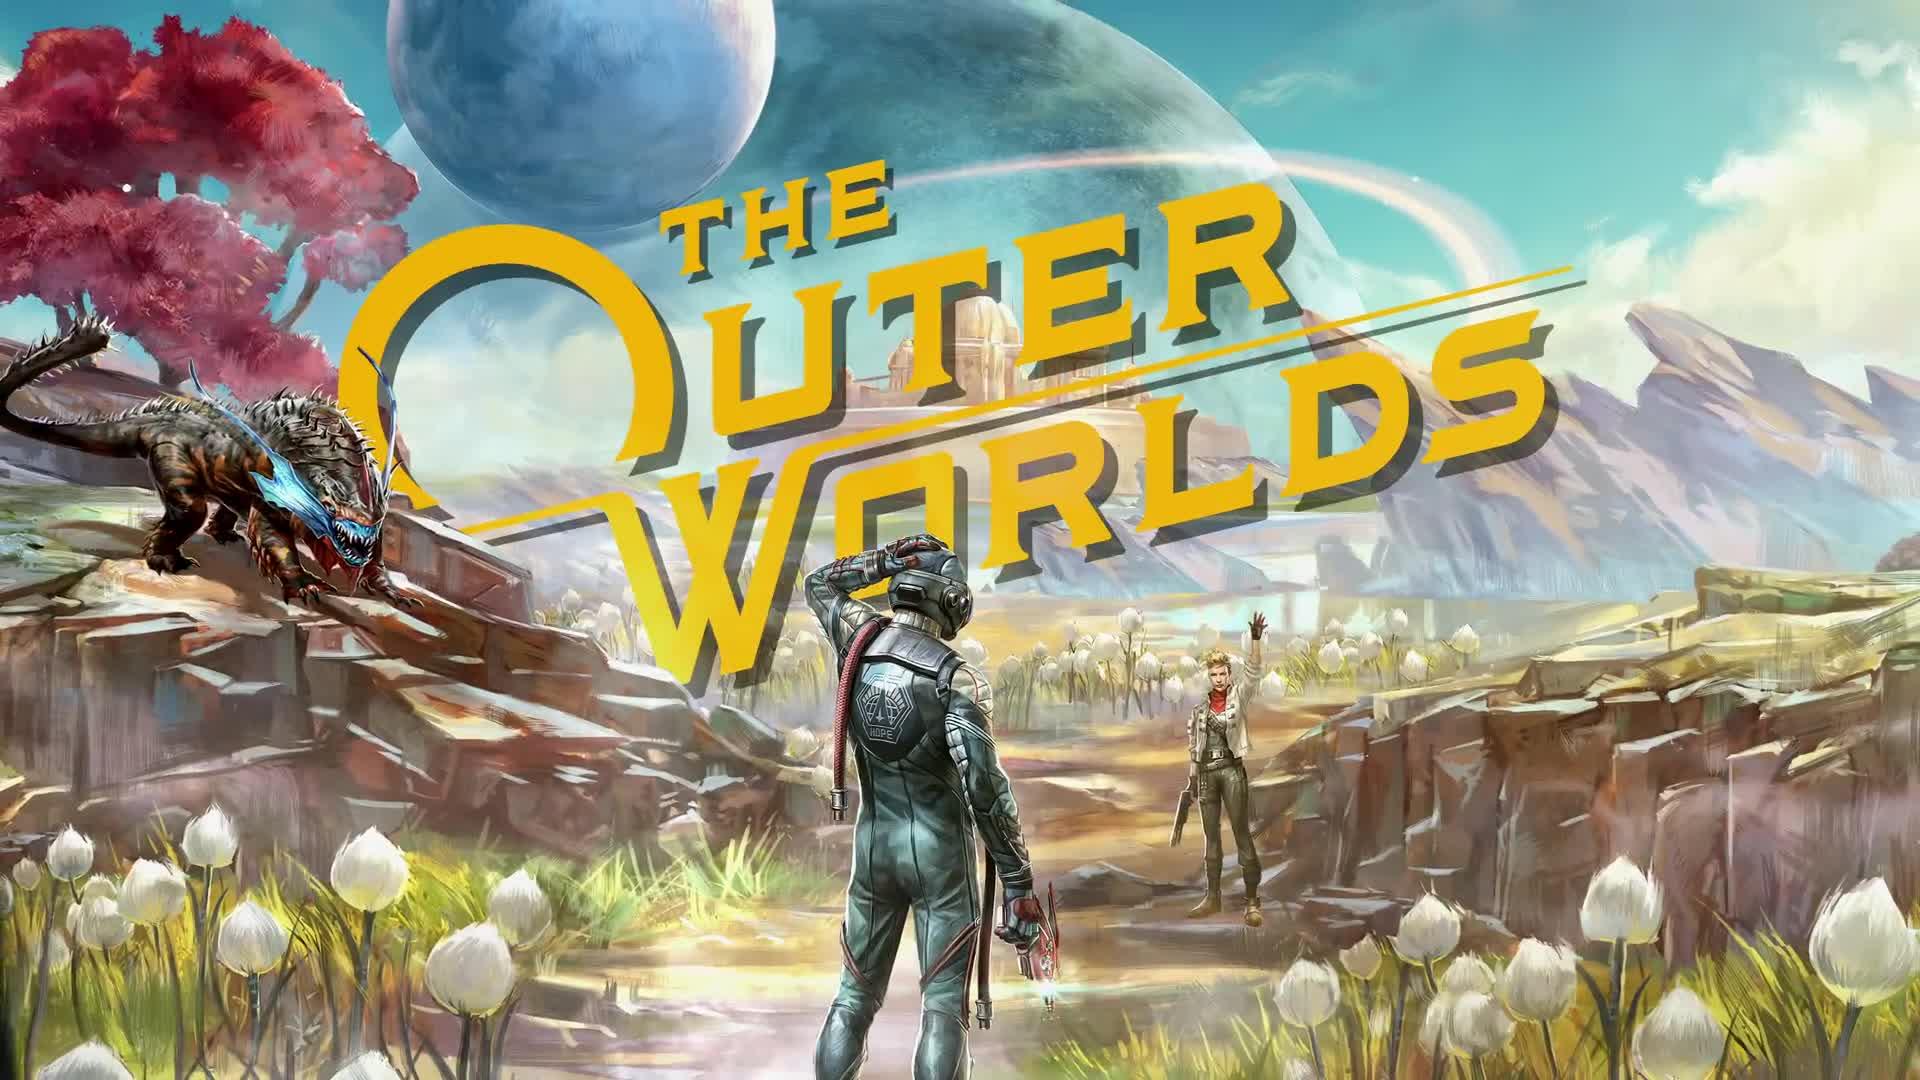 Trailer, Xbox, E3, Rollenspiel, E3 2019, Science Fiction, Obsidian Entertainment, Scifi, The Outer Worlds